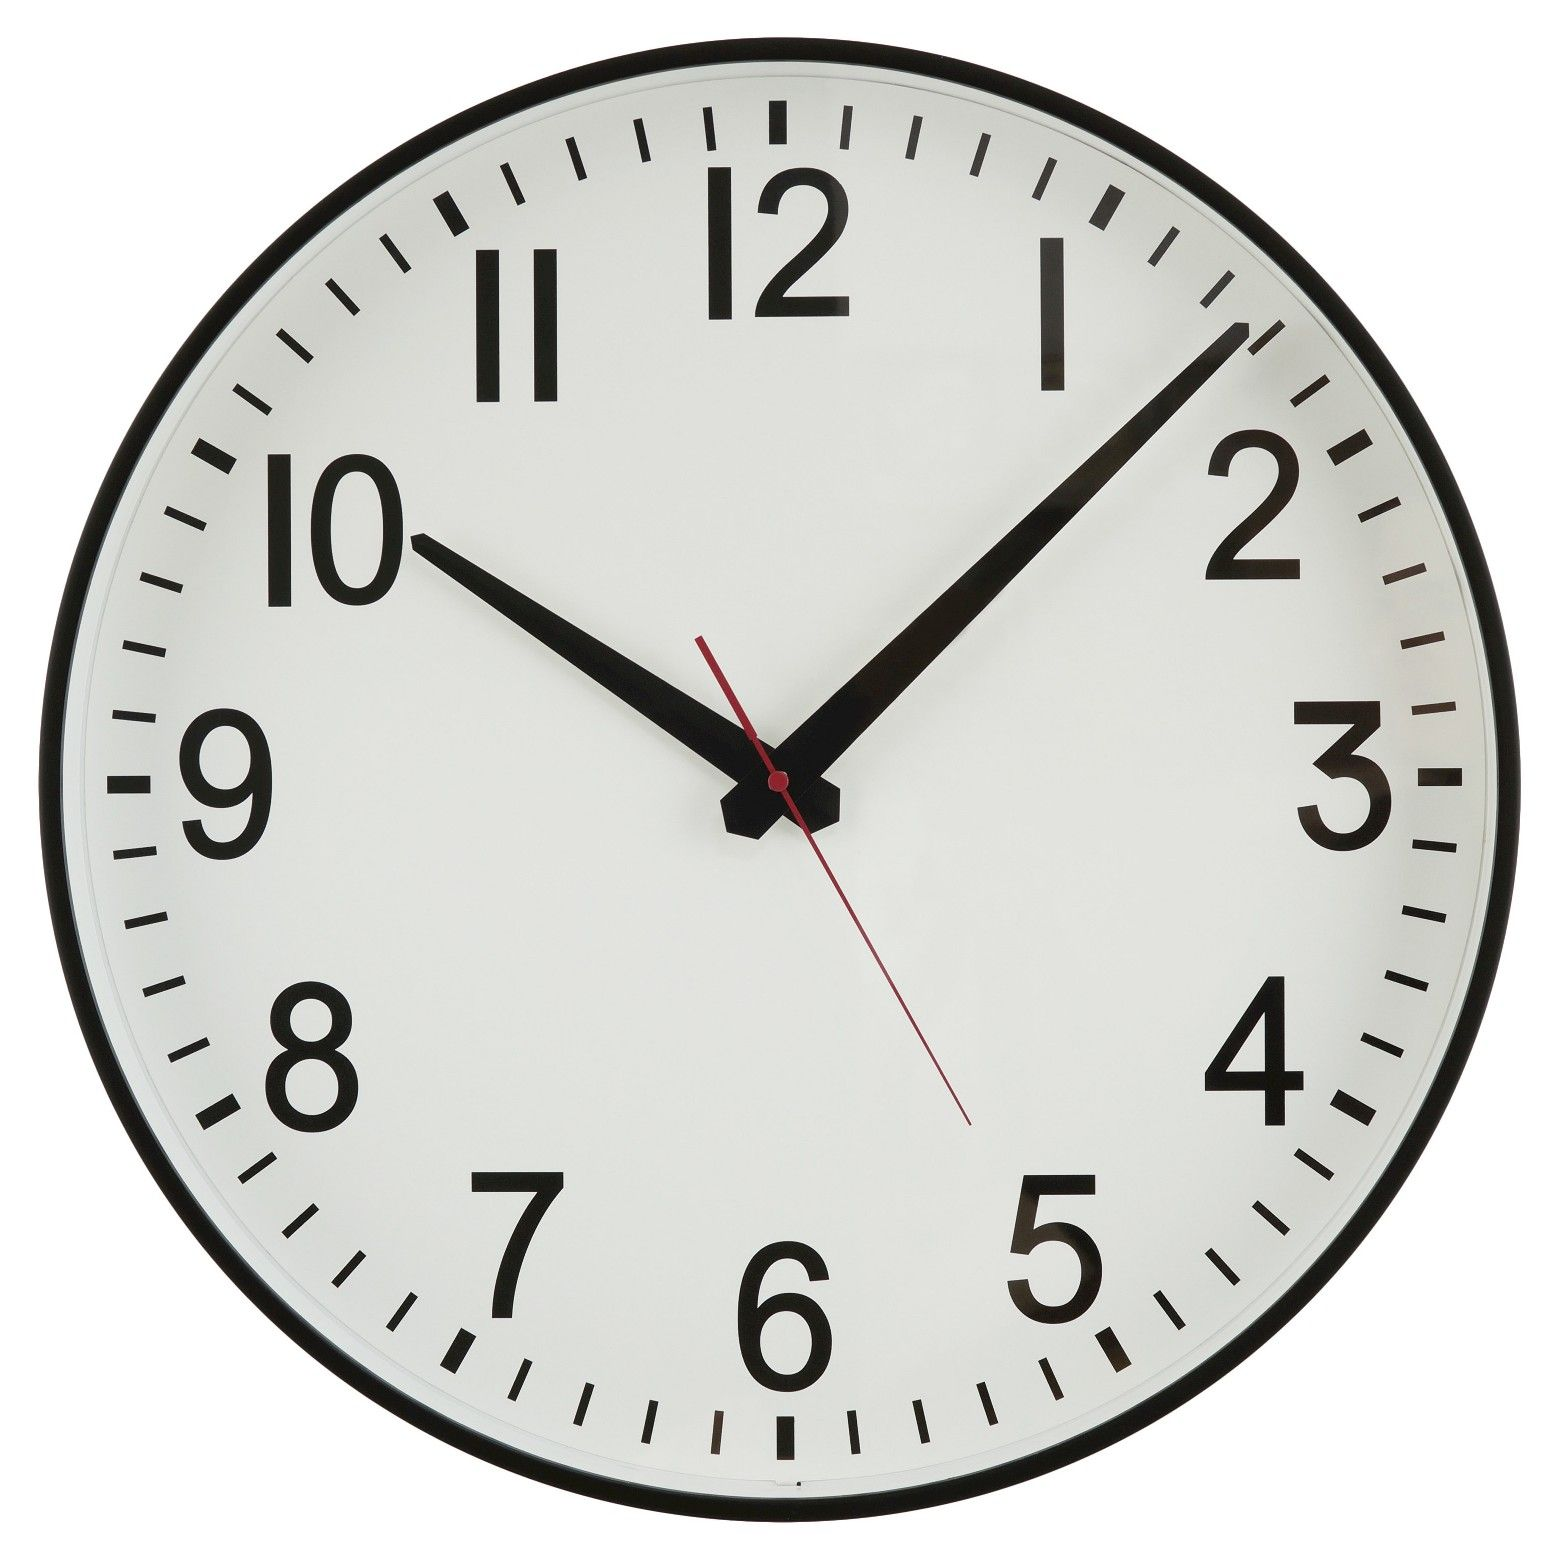 20 Wall Clock Black White Threshold Wall Clock Clock